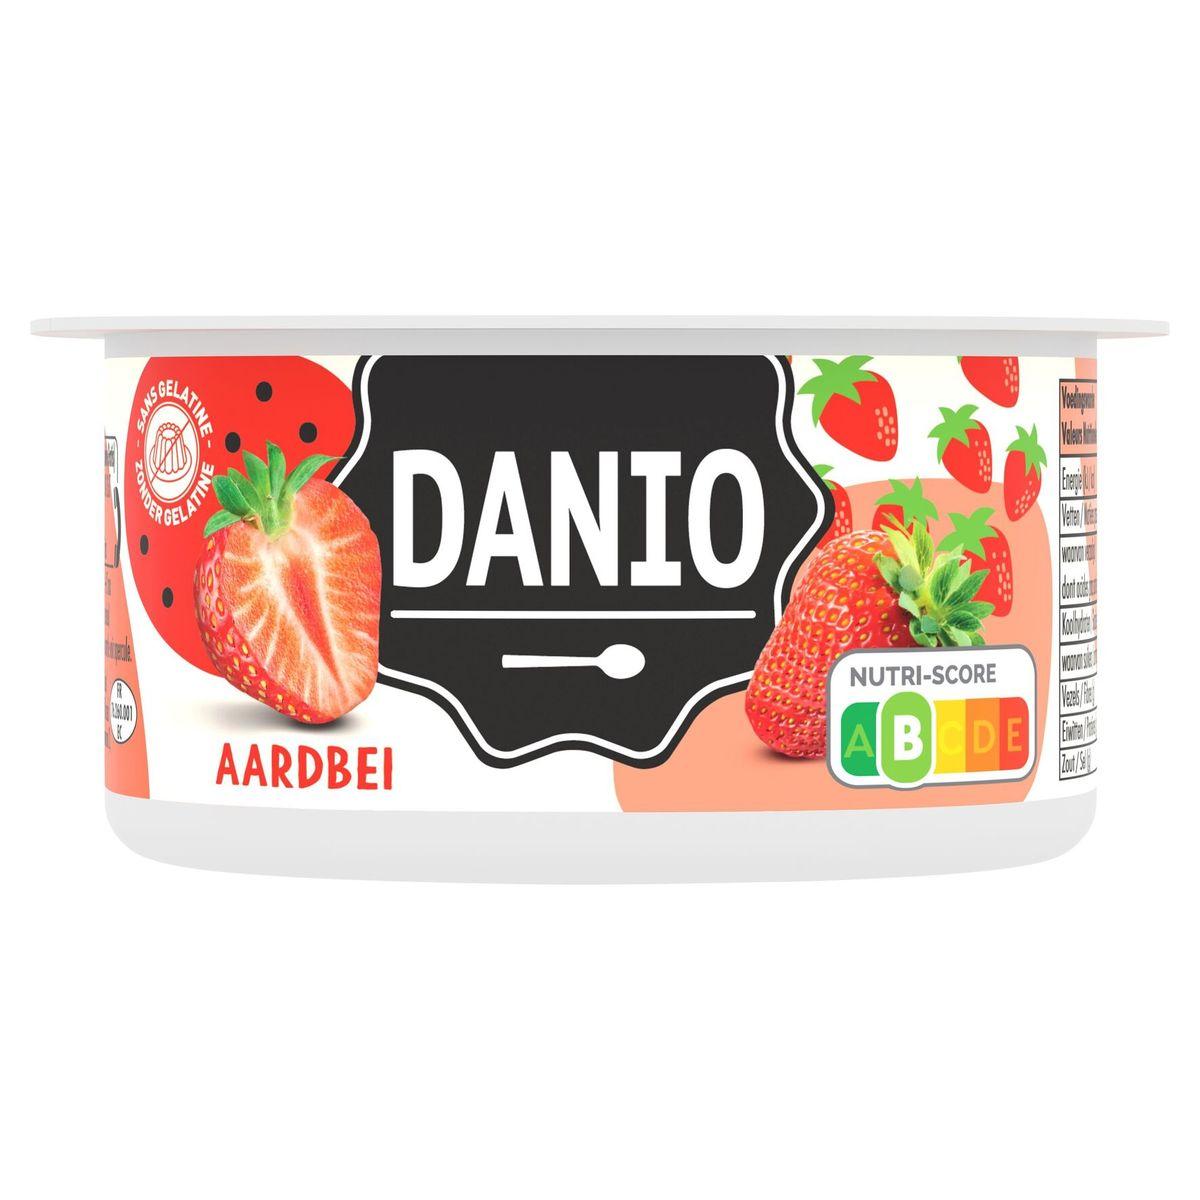 Danio Aardbei 180 g